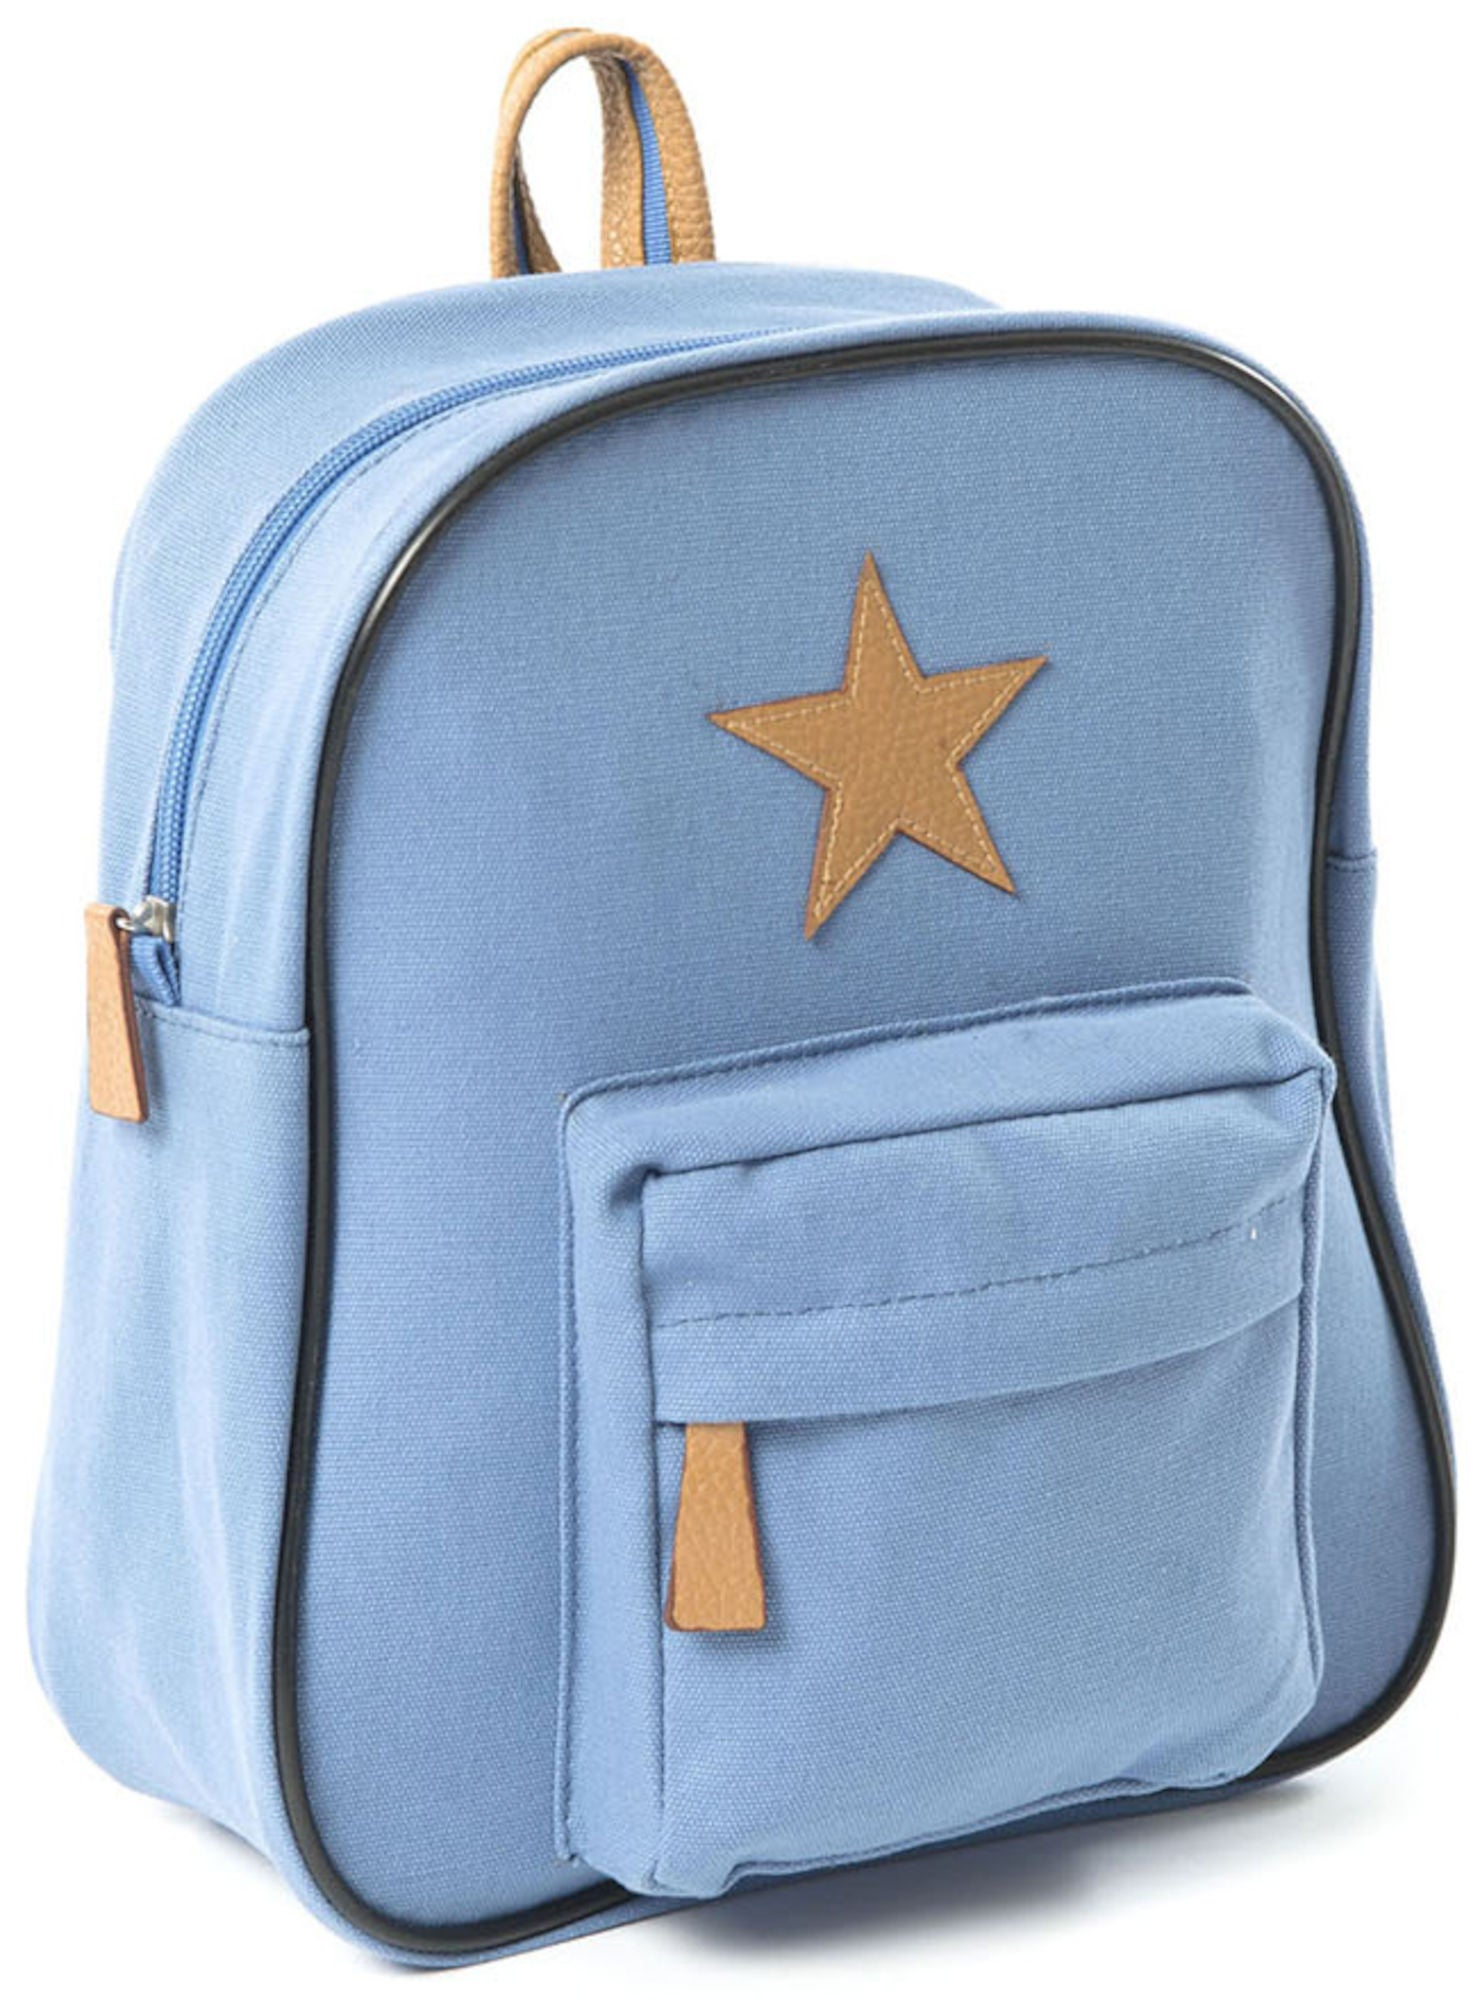 Smallstuff Ryggsäck Star, Sky Blue